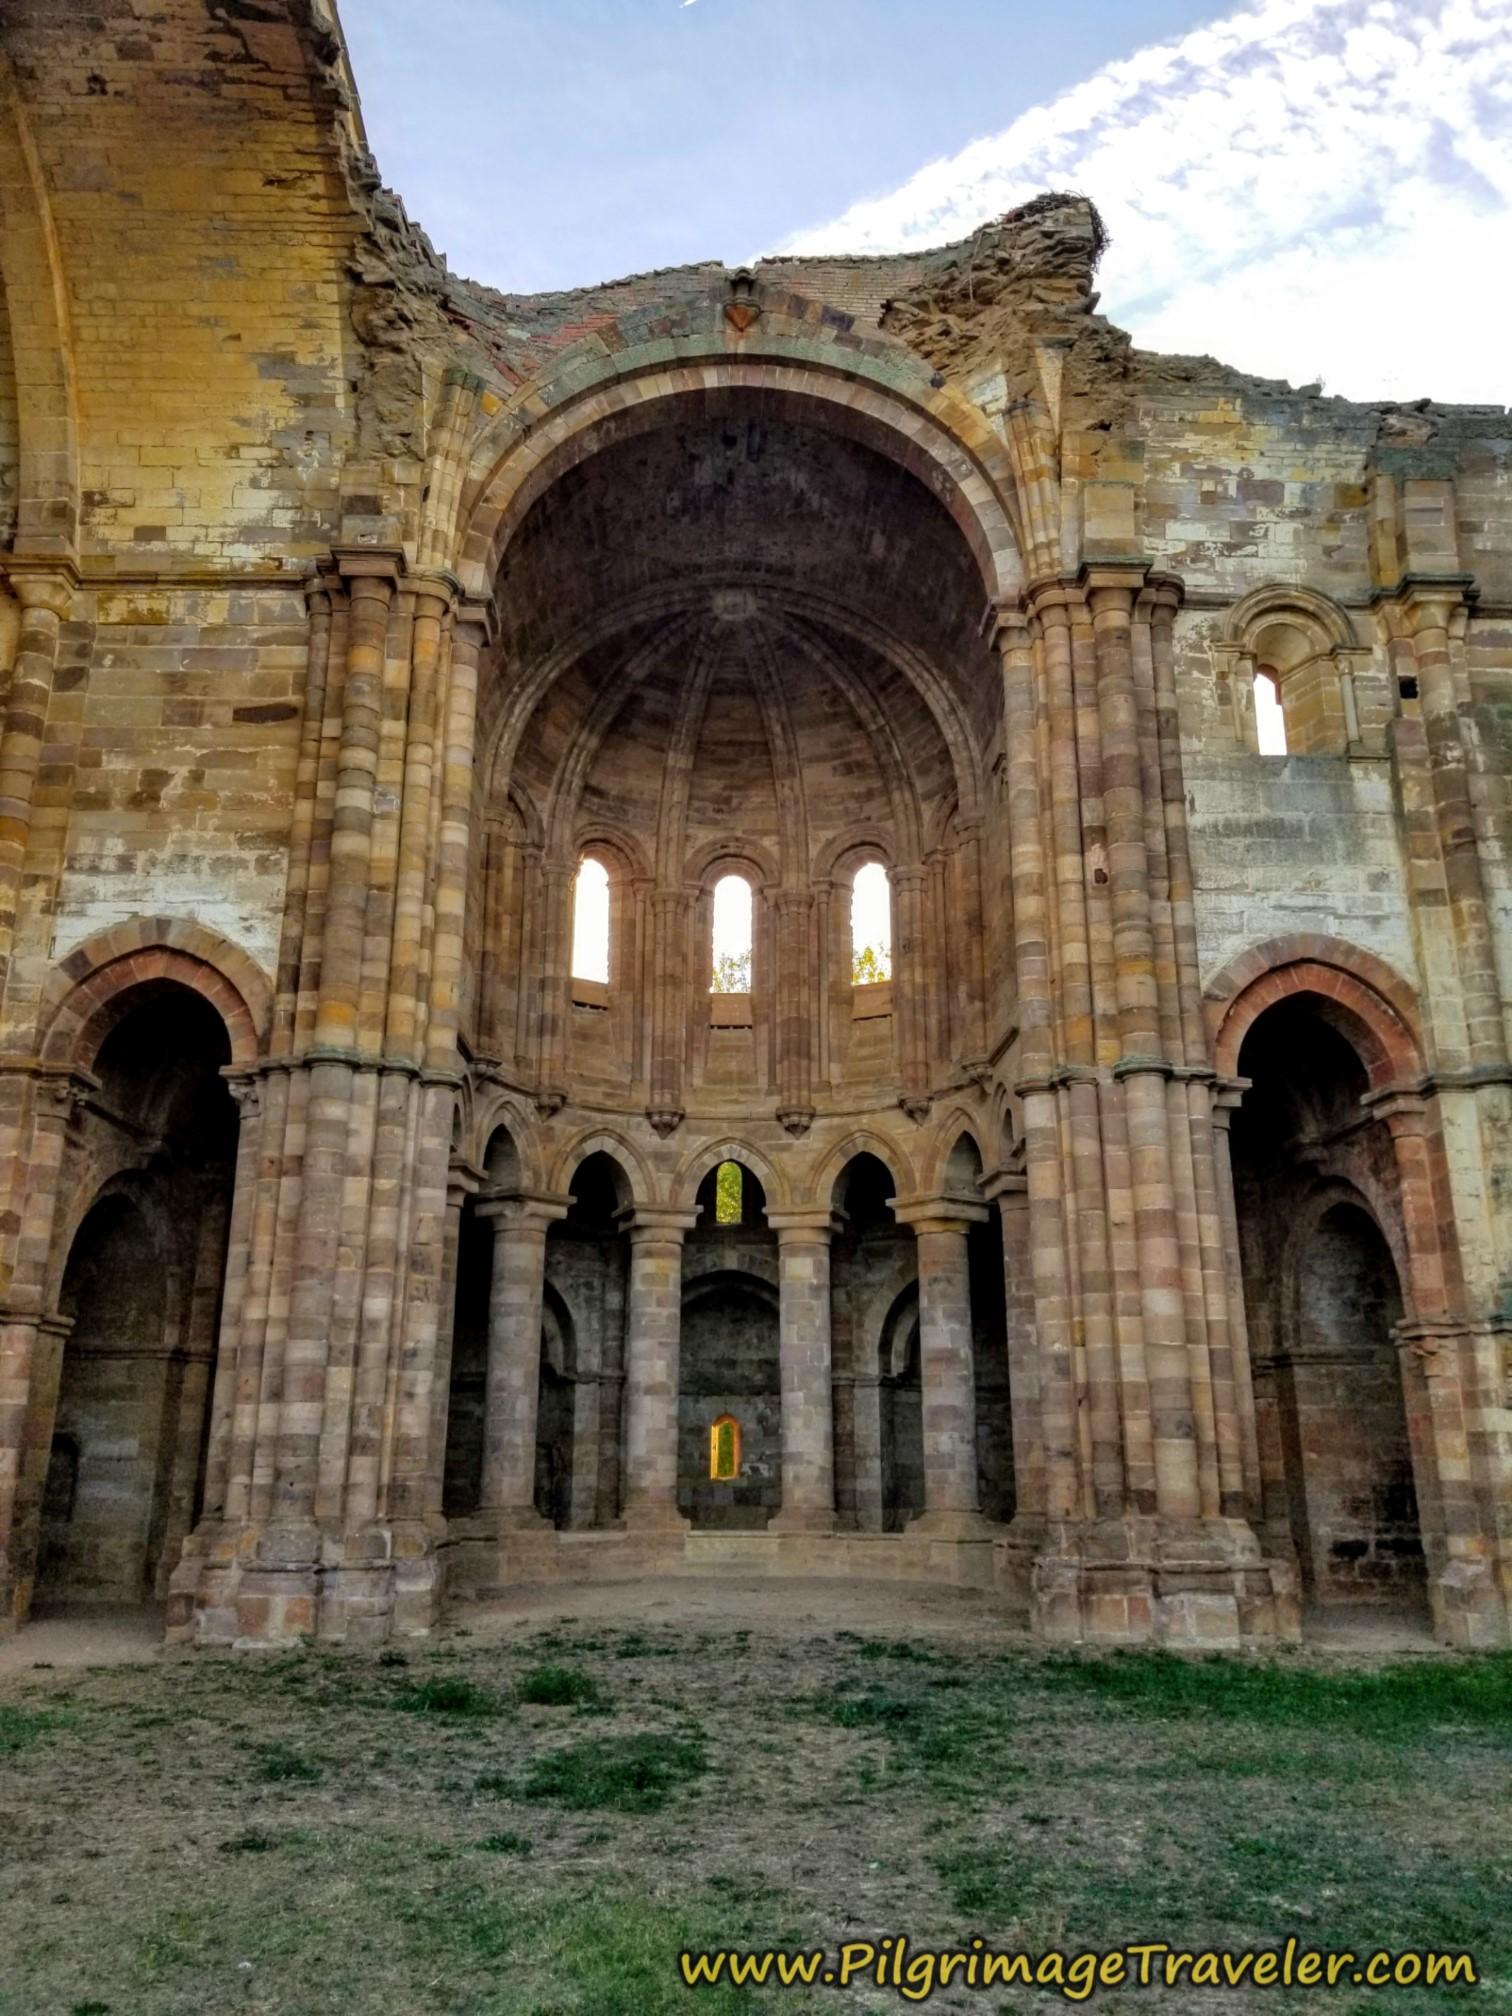 Ruined Interior Apse of the Church at the Moreruela Abbey on the Camino Sanabrés from Granja de Moreruela to Tábara